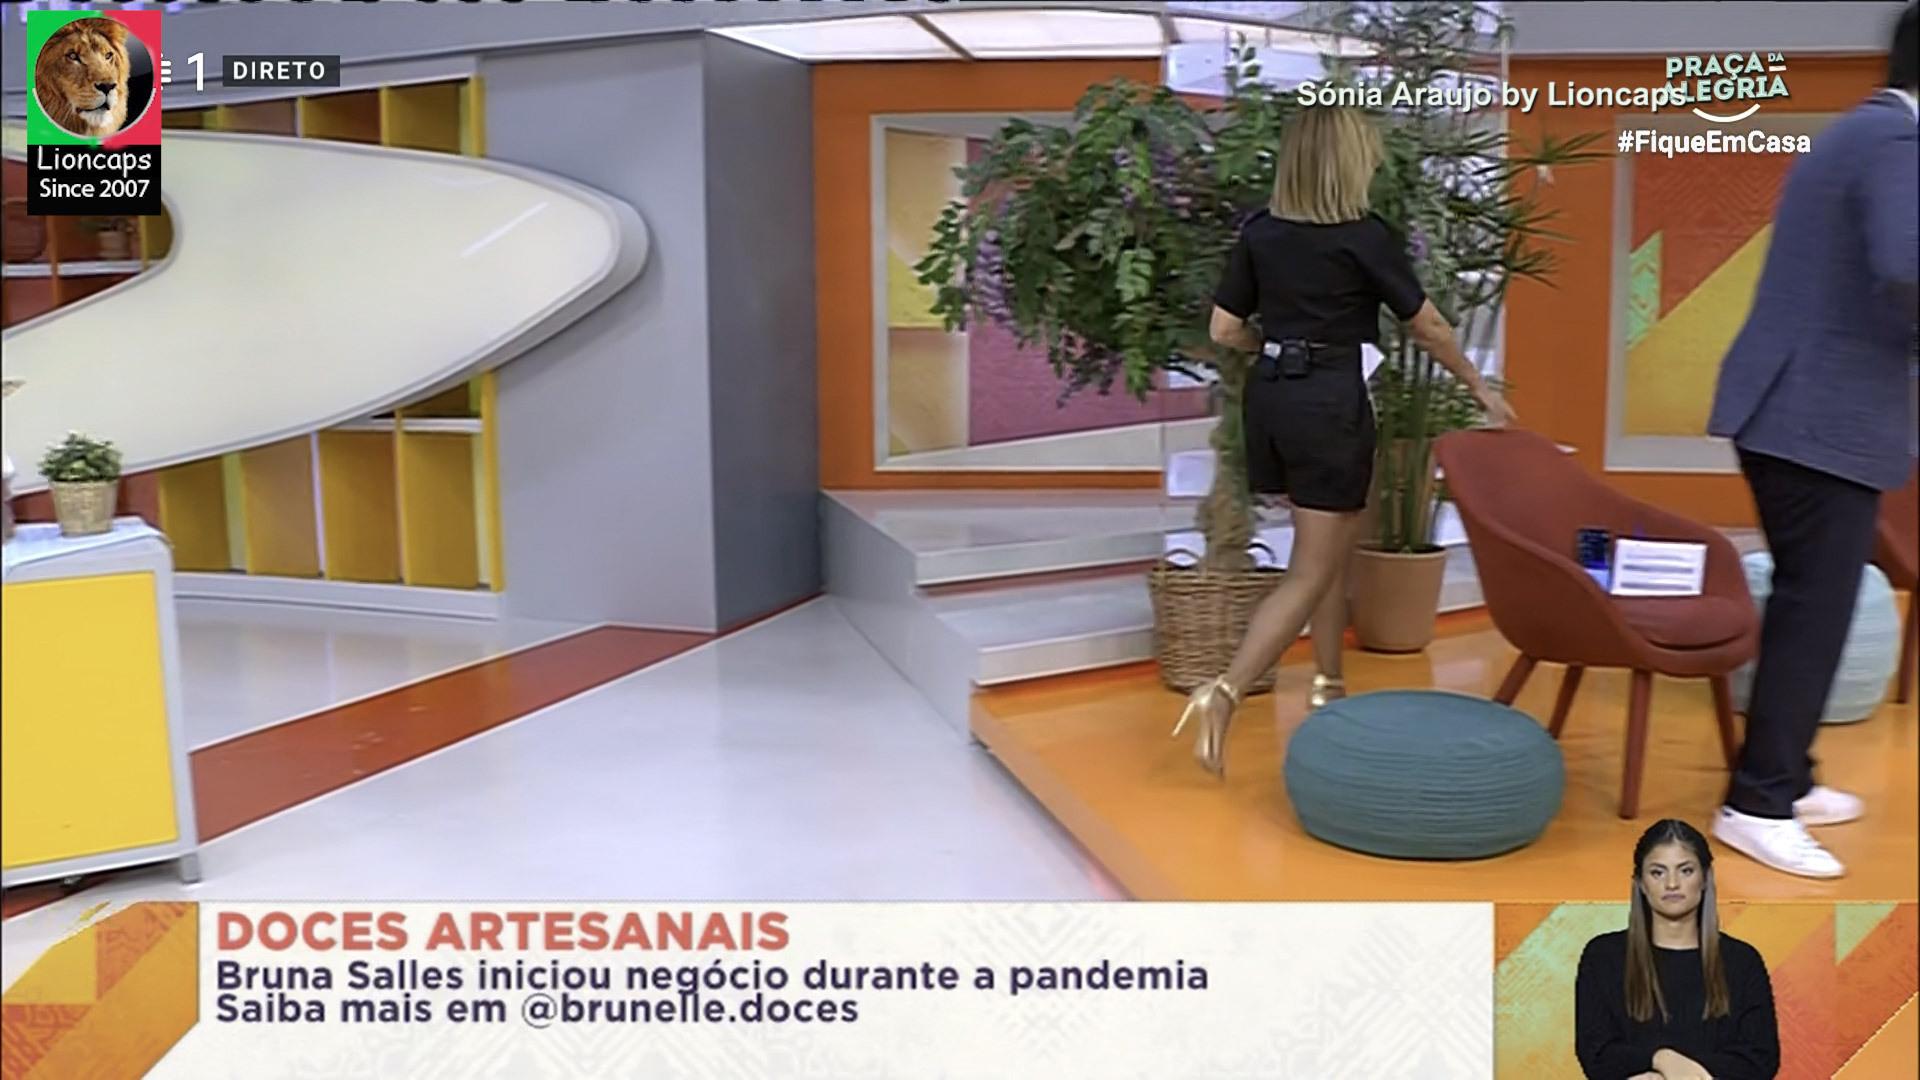 sonia_araujo_praca_lioncaps_11_04_2021 (1).jpg